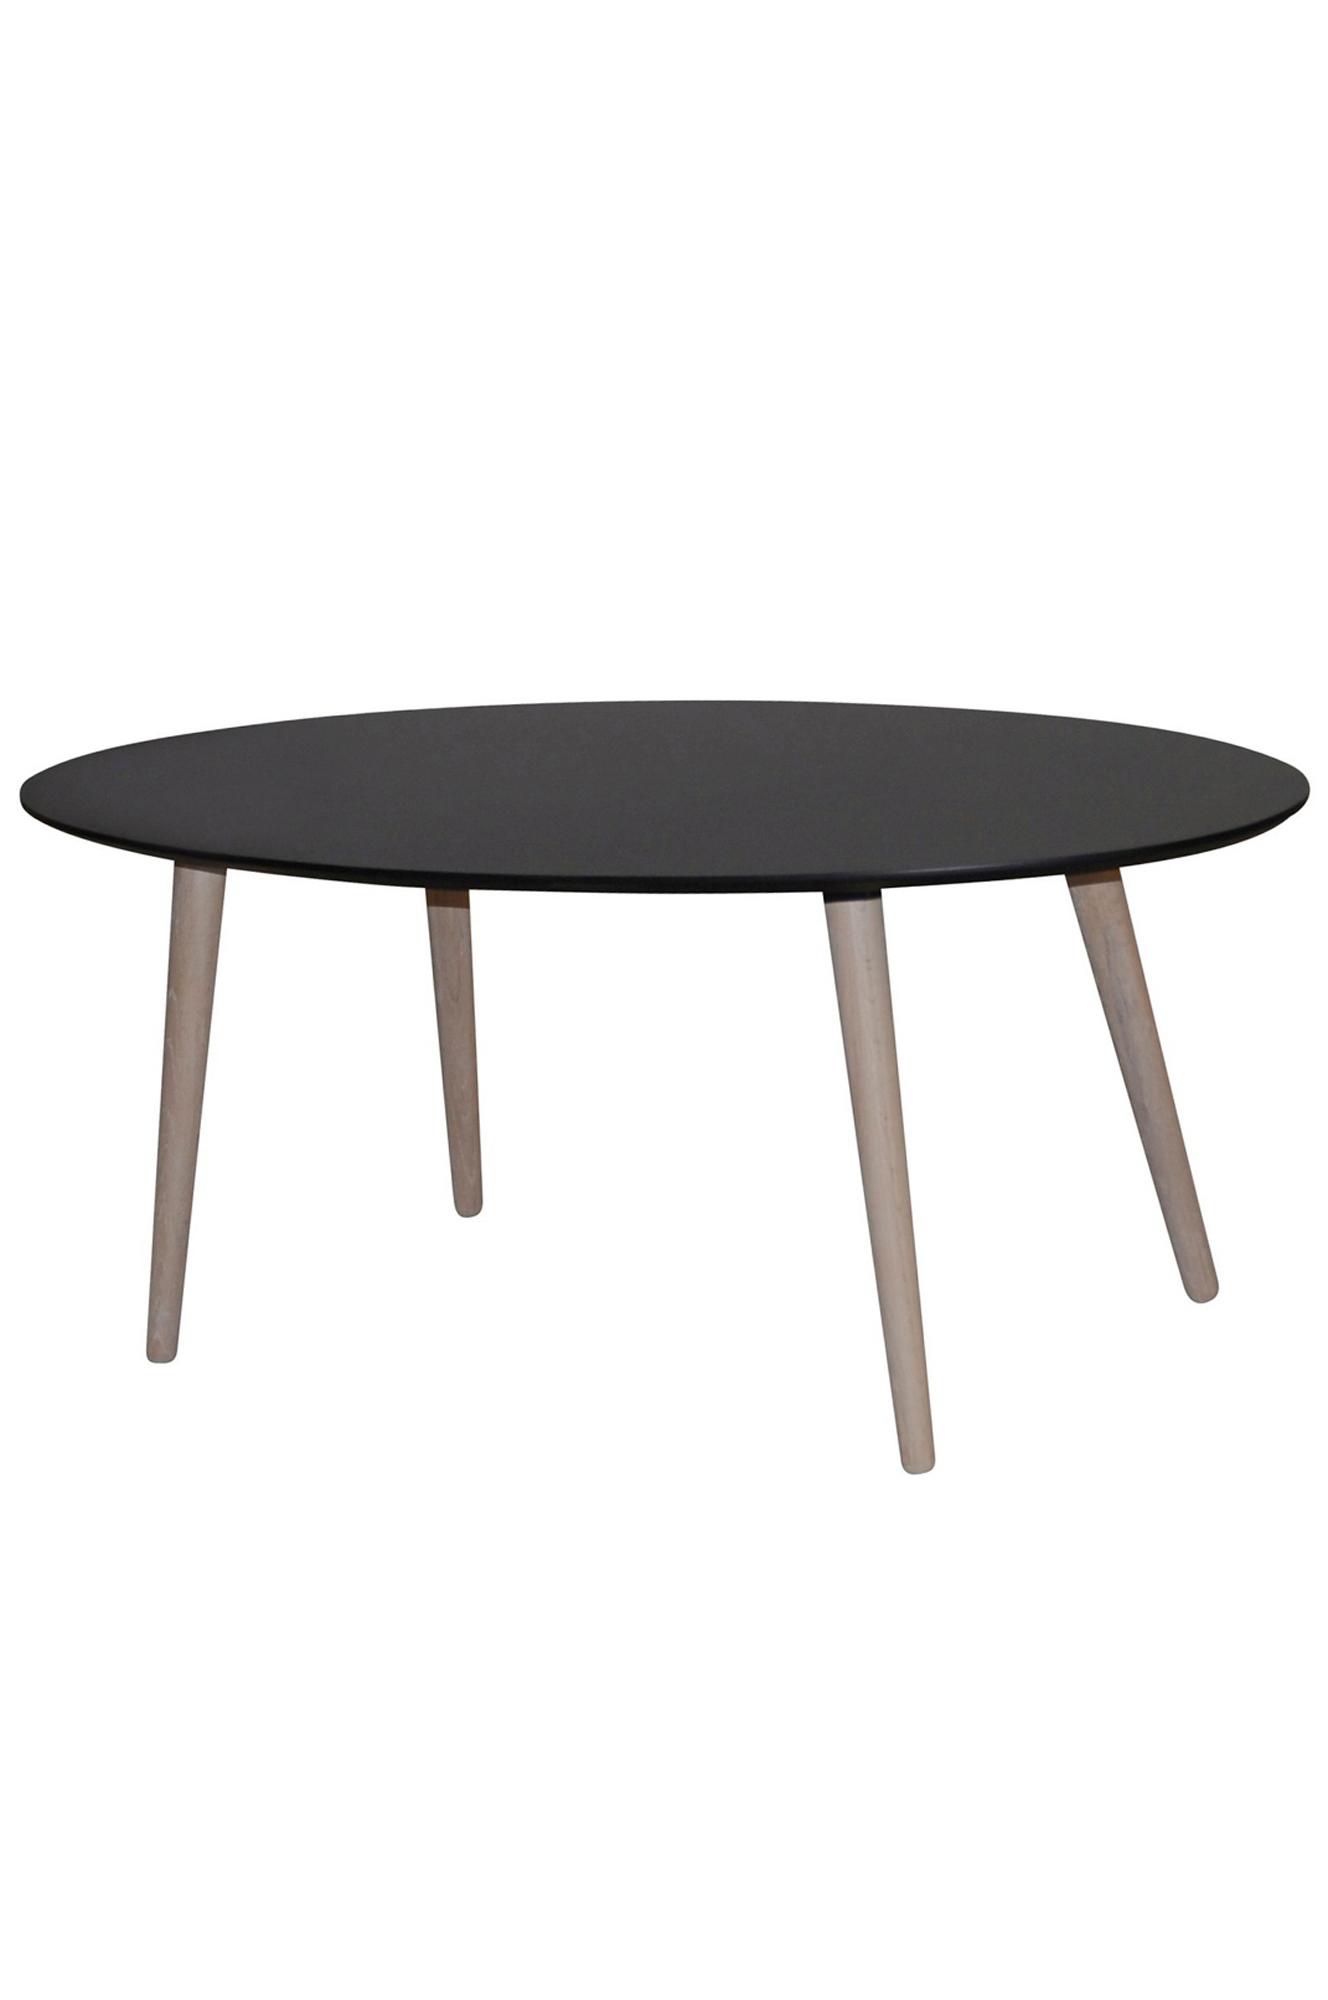 Sohvapöytä 125x70 cm